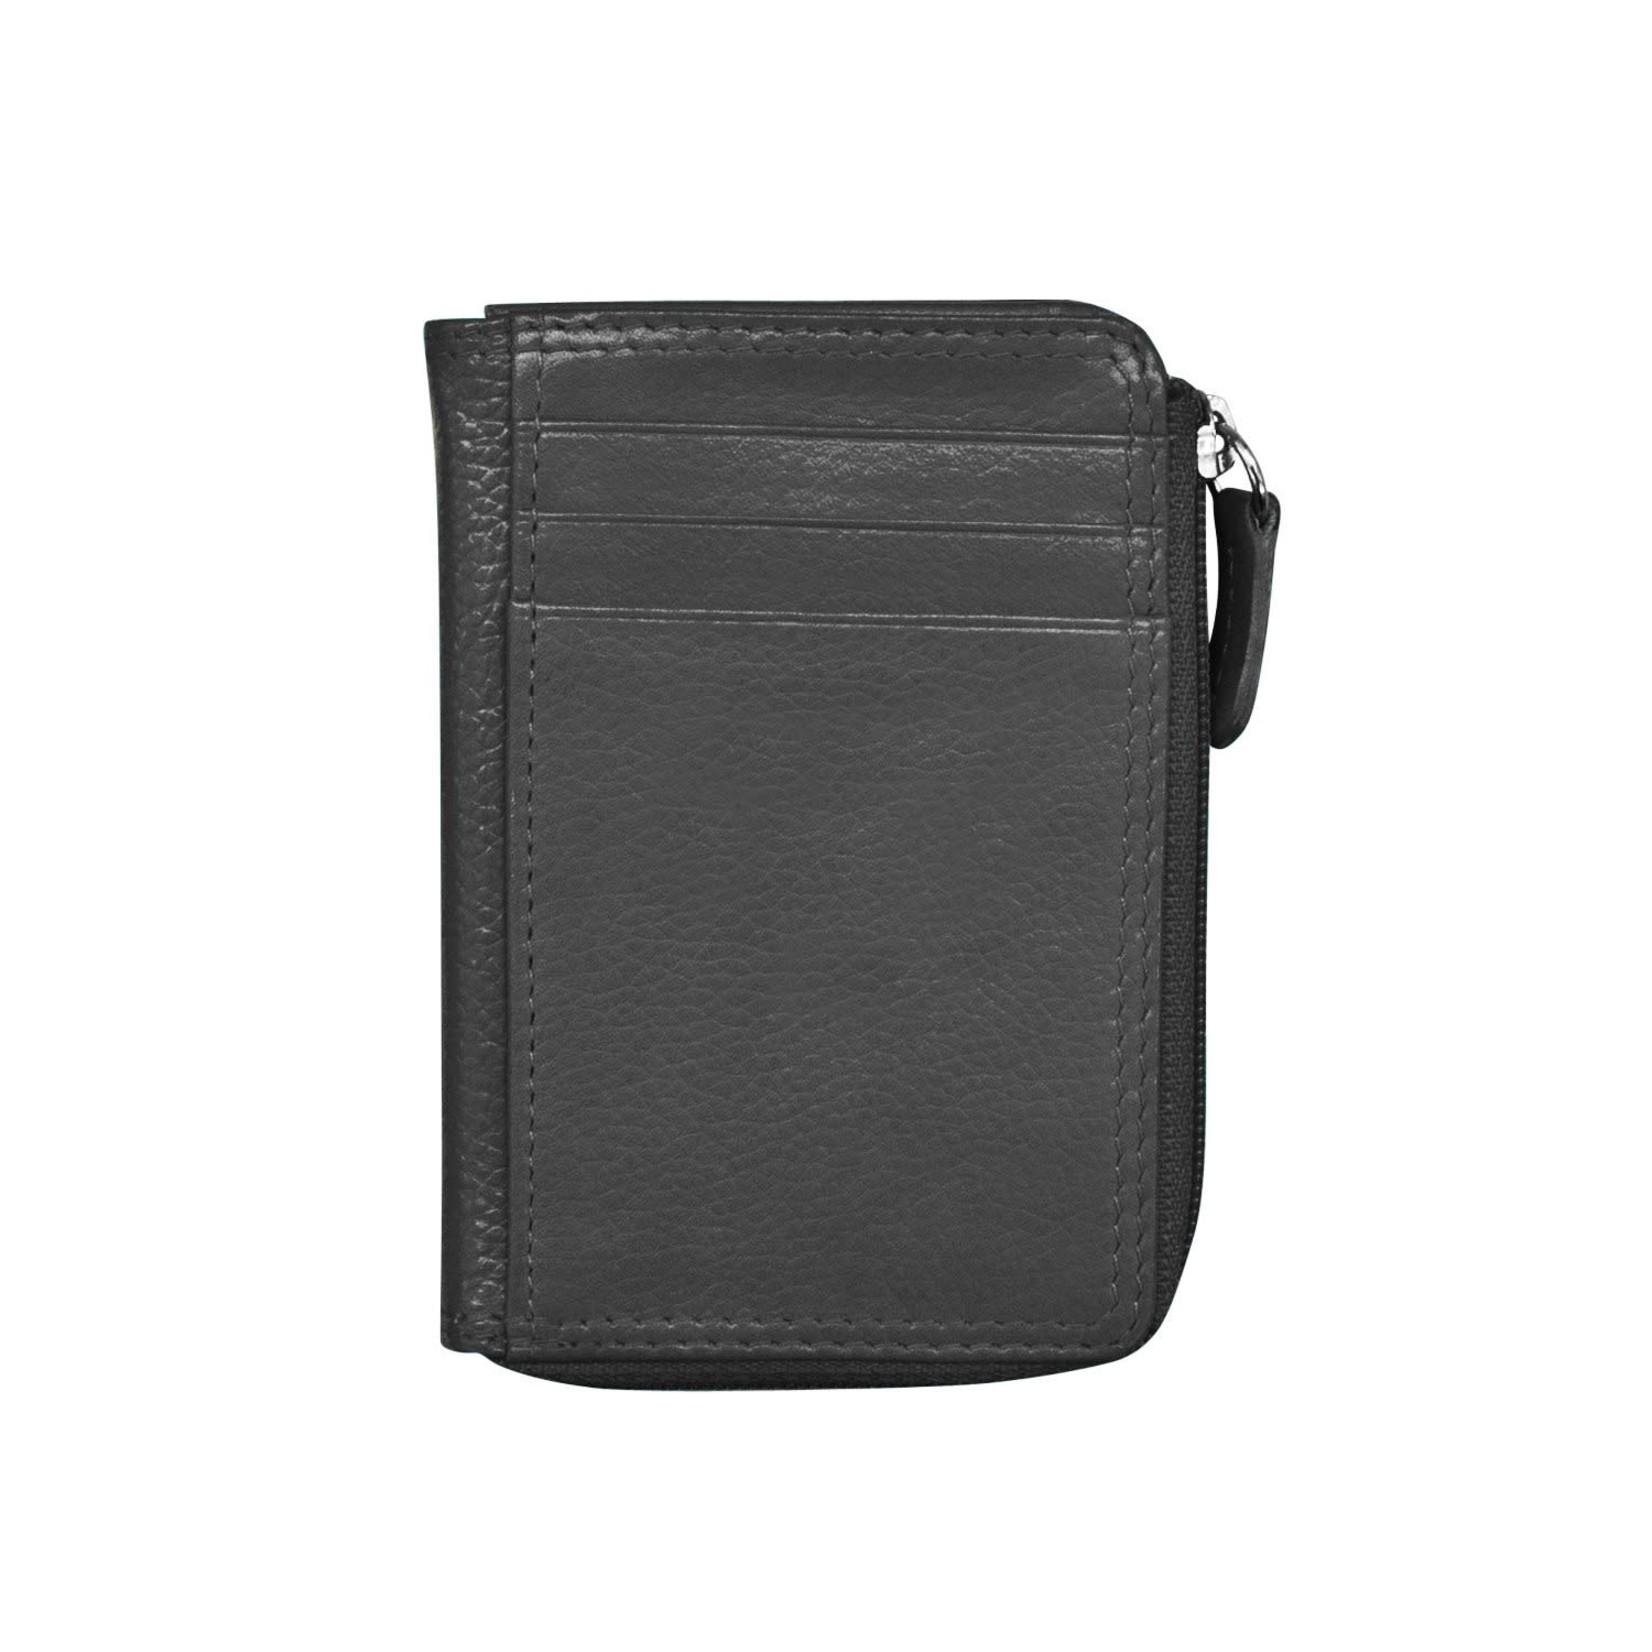 Leather Handbags and Accessories 7411 Black - RFID CC ID Holder